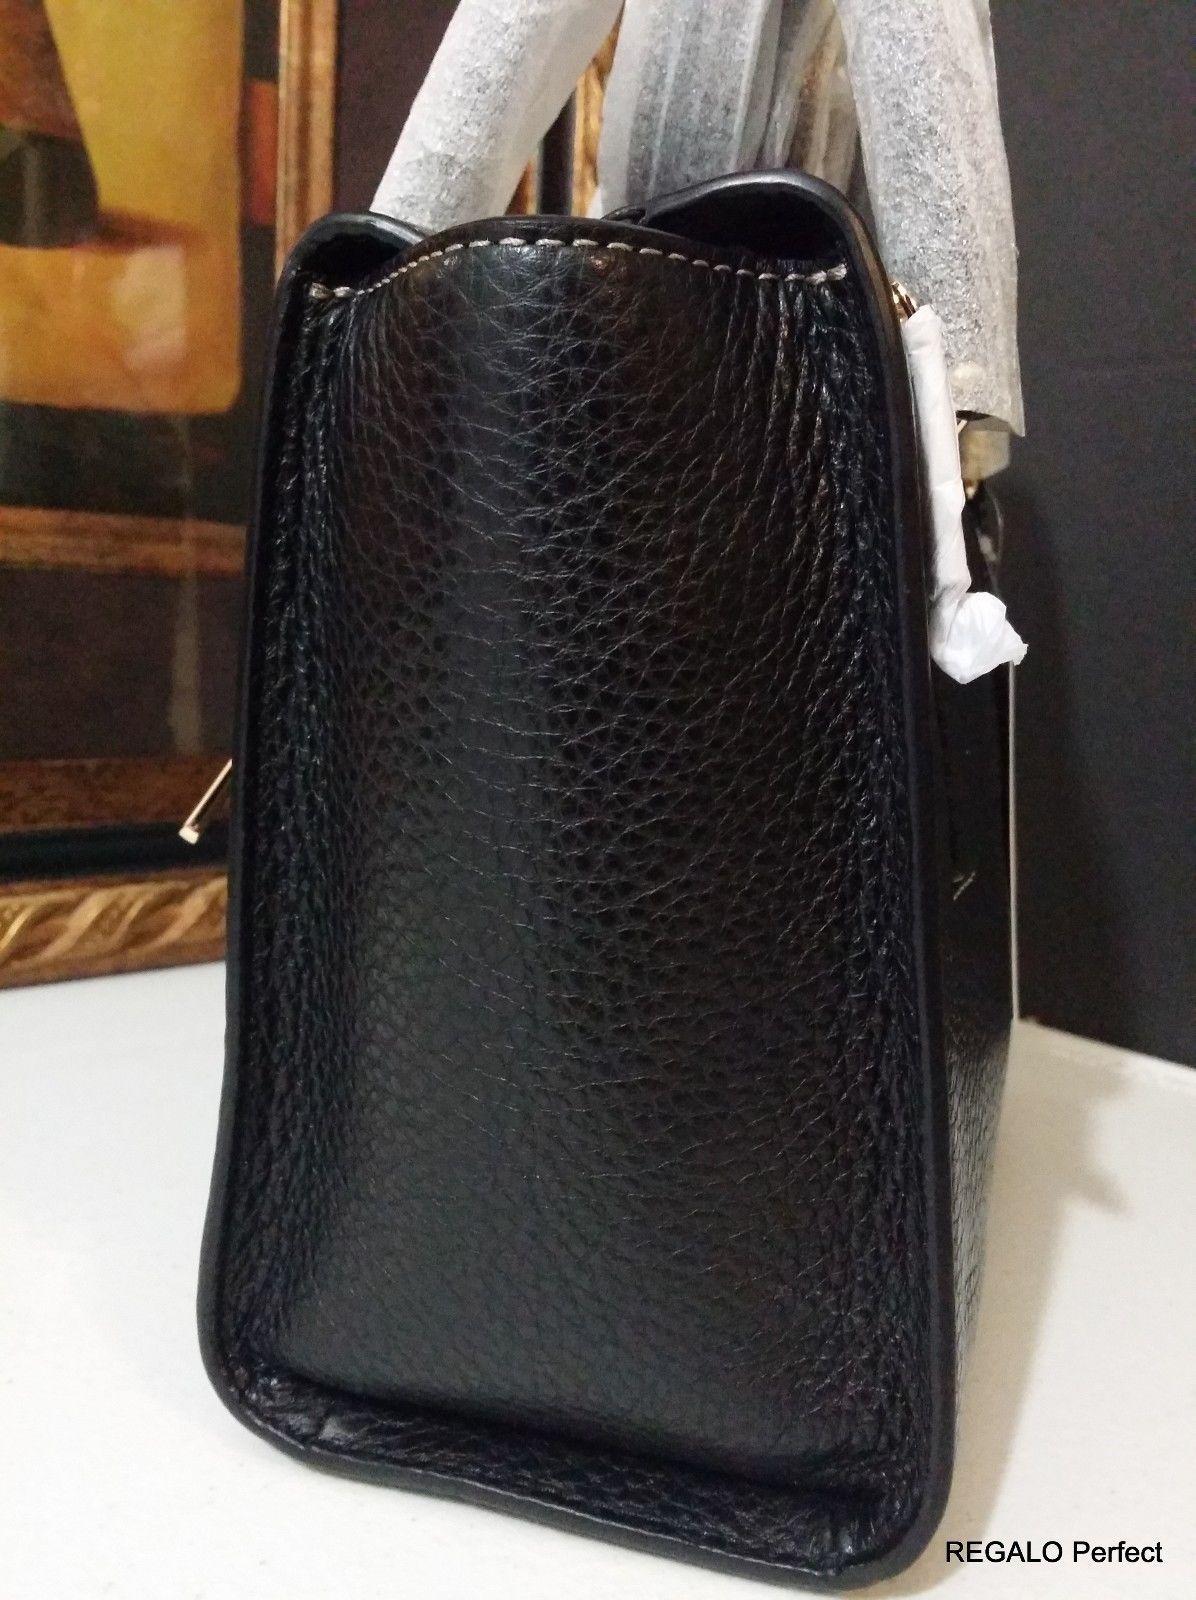 NWT Michael Kors Selby Medium Top Zip Messenger Leather Black MSRP $298